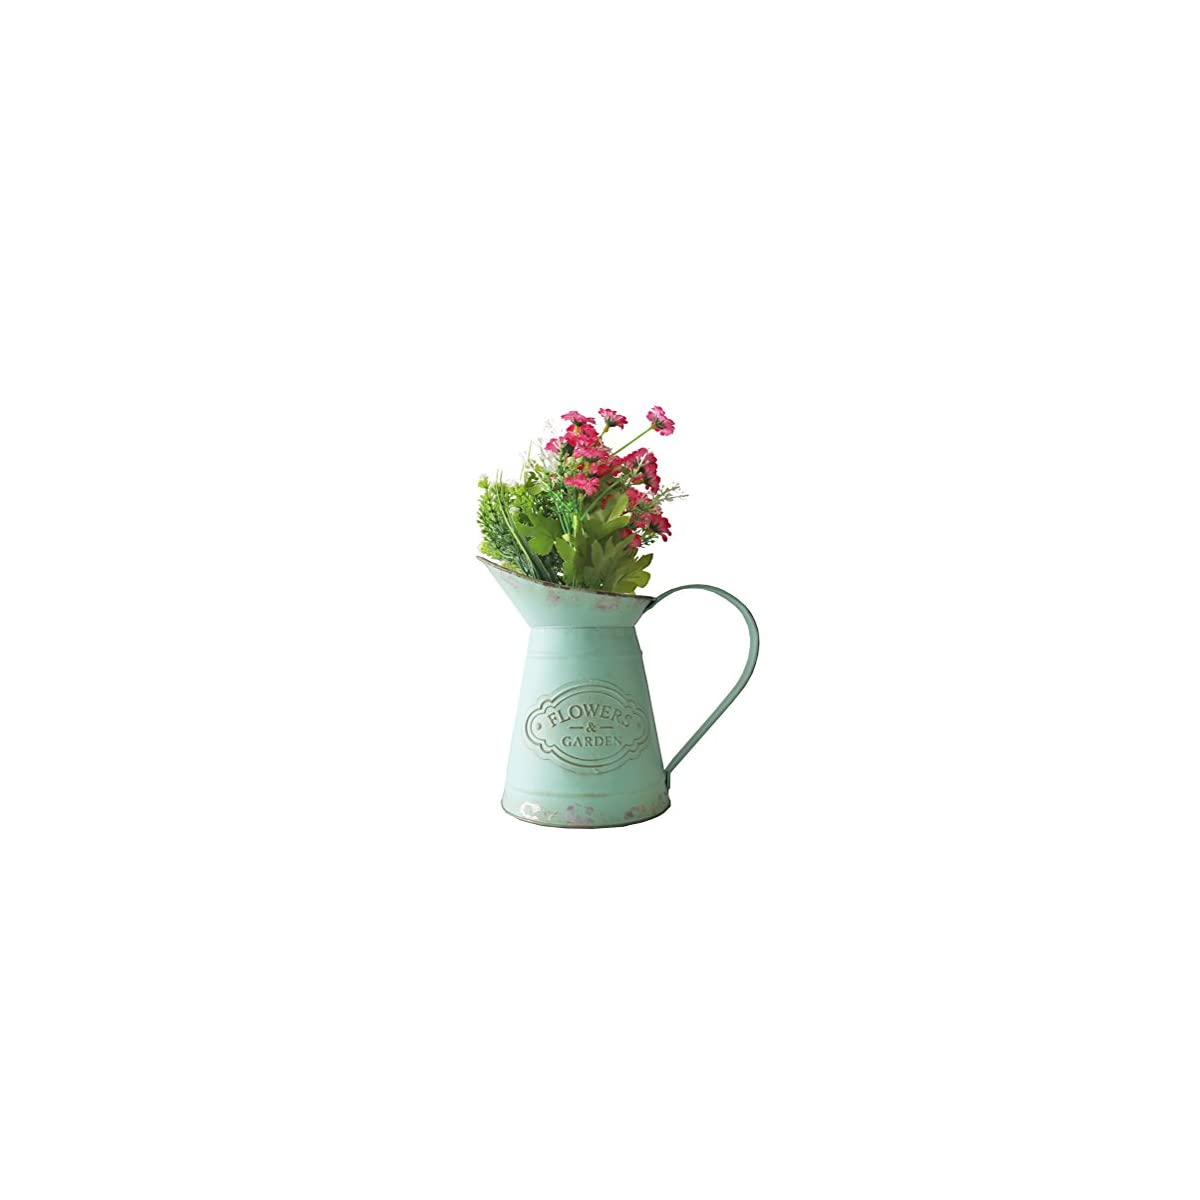 Metall Pflanztopf Gießkanne Flowers Garden Vintage Blumentopf Deko Landhaus 26cm